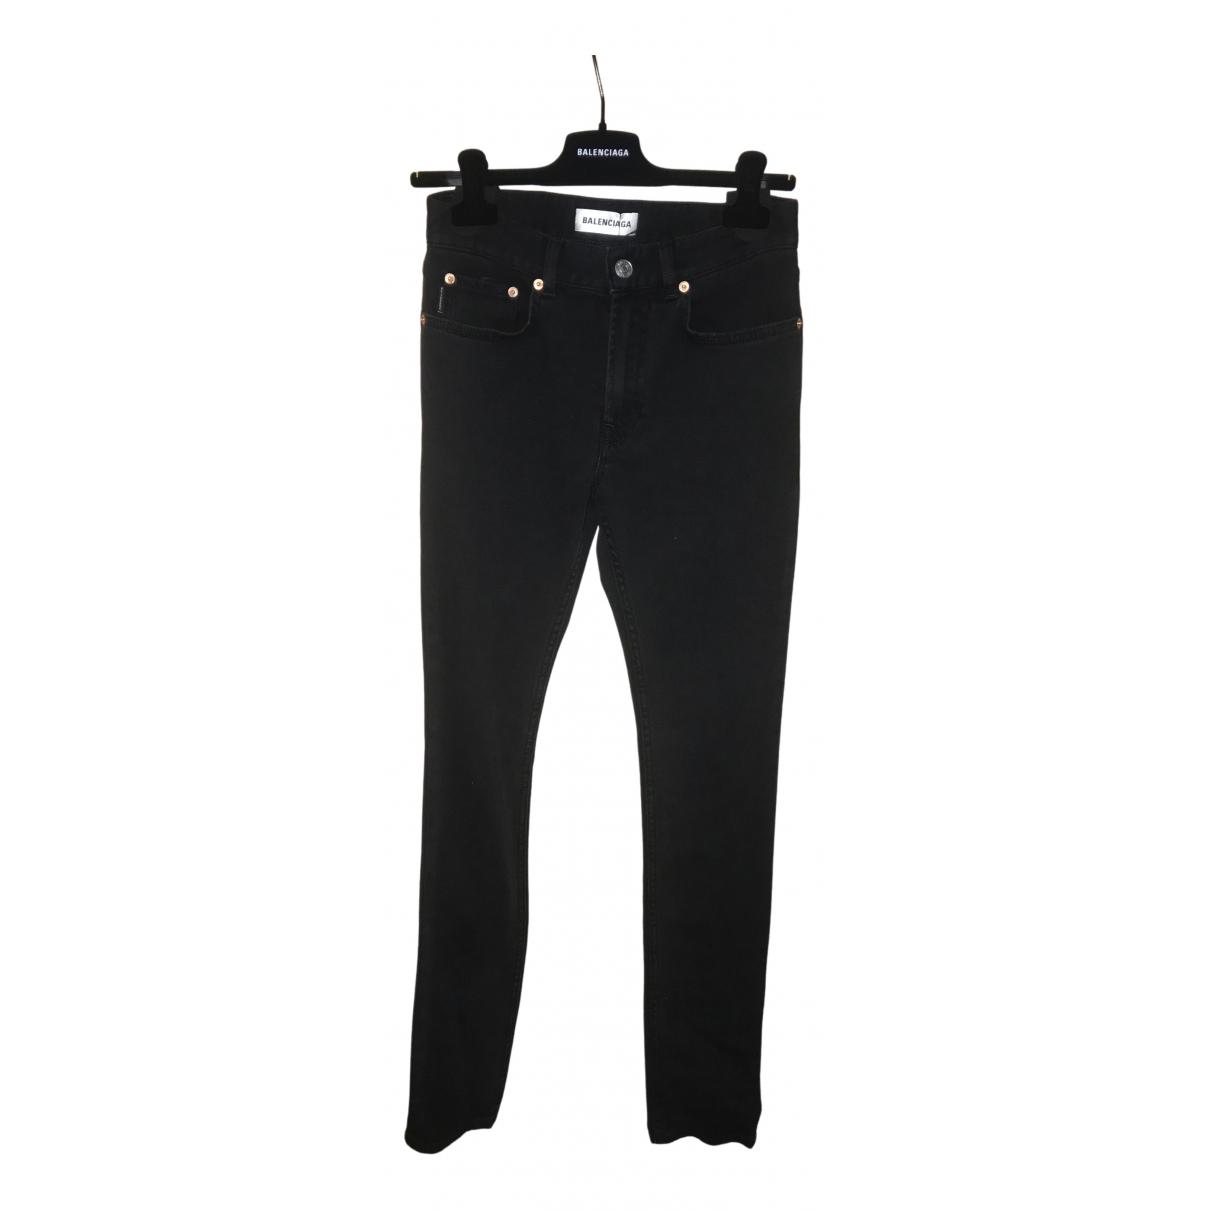 Balenciaga \N Black Denim - Jeans Jeans for Women 26 US